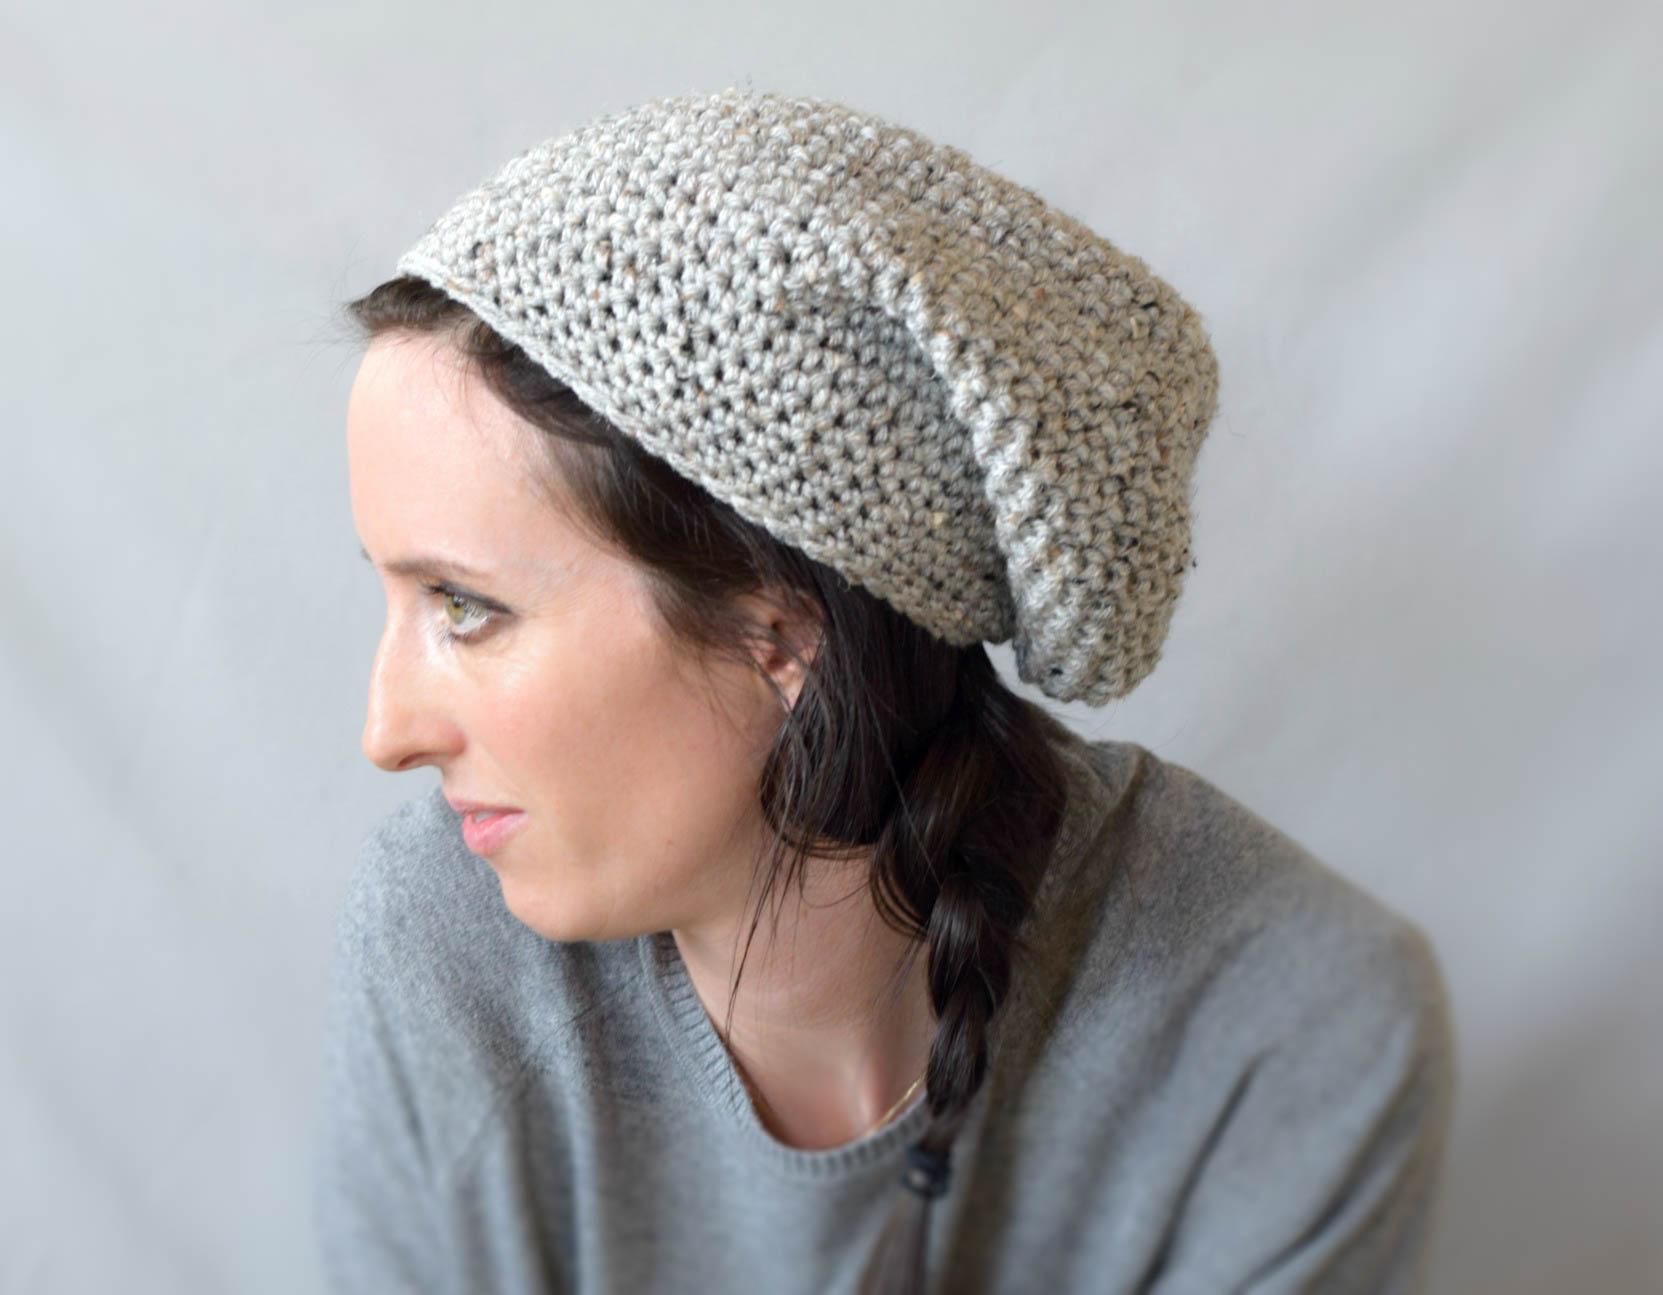 467241fd3cc 21+ Slouchy Beanie Crochet Patterns for Beginners